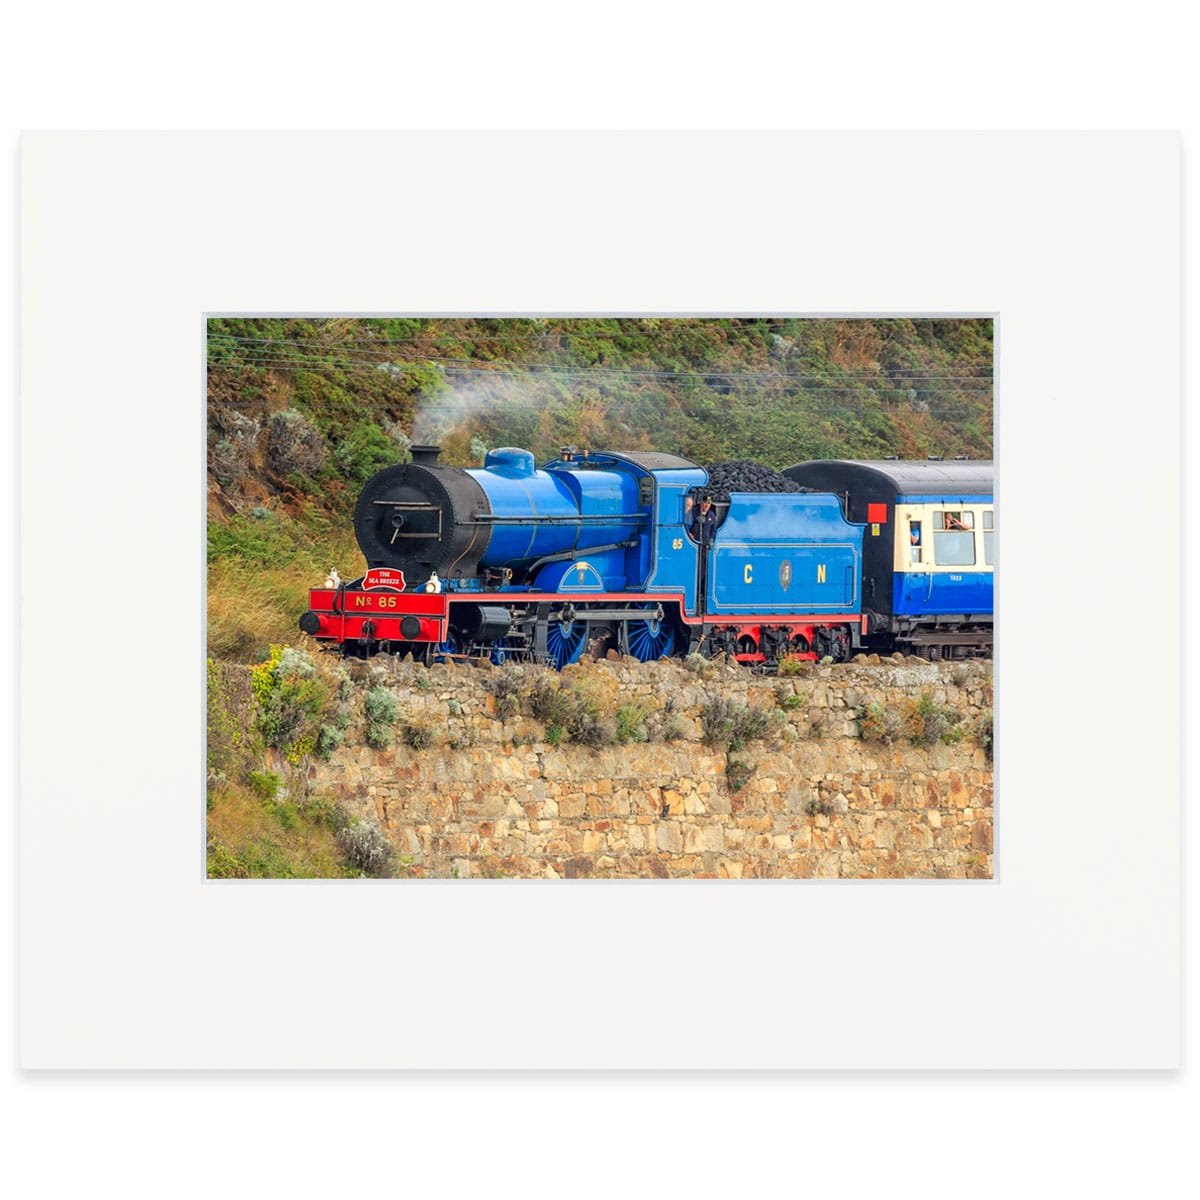 "Locomotive No. 85 ""Merlin"" Fine art print 8"" x 10"""